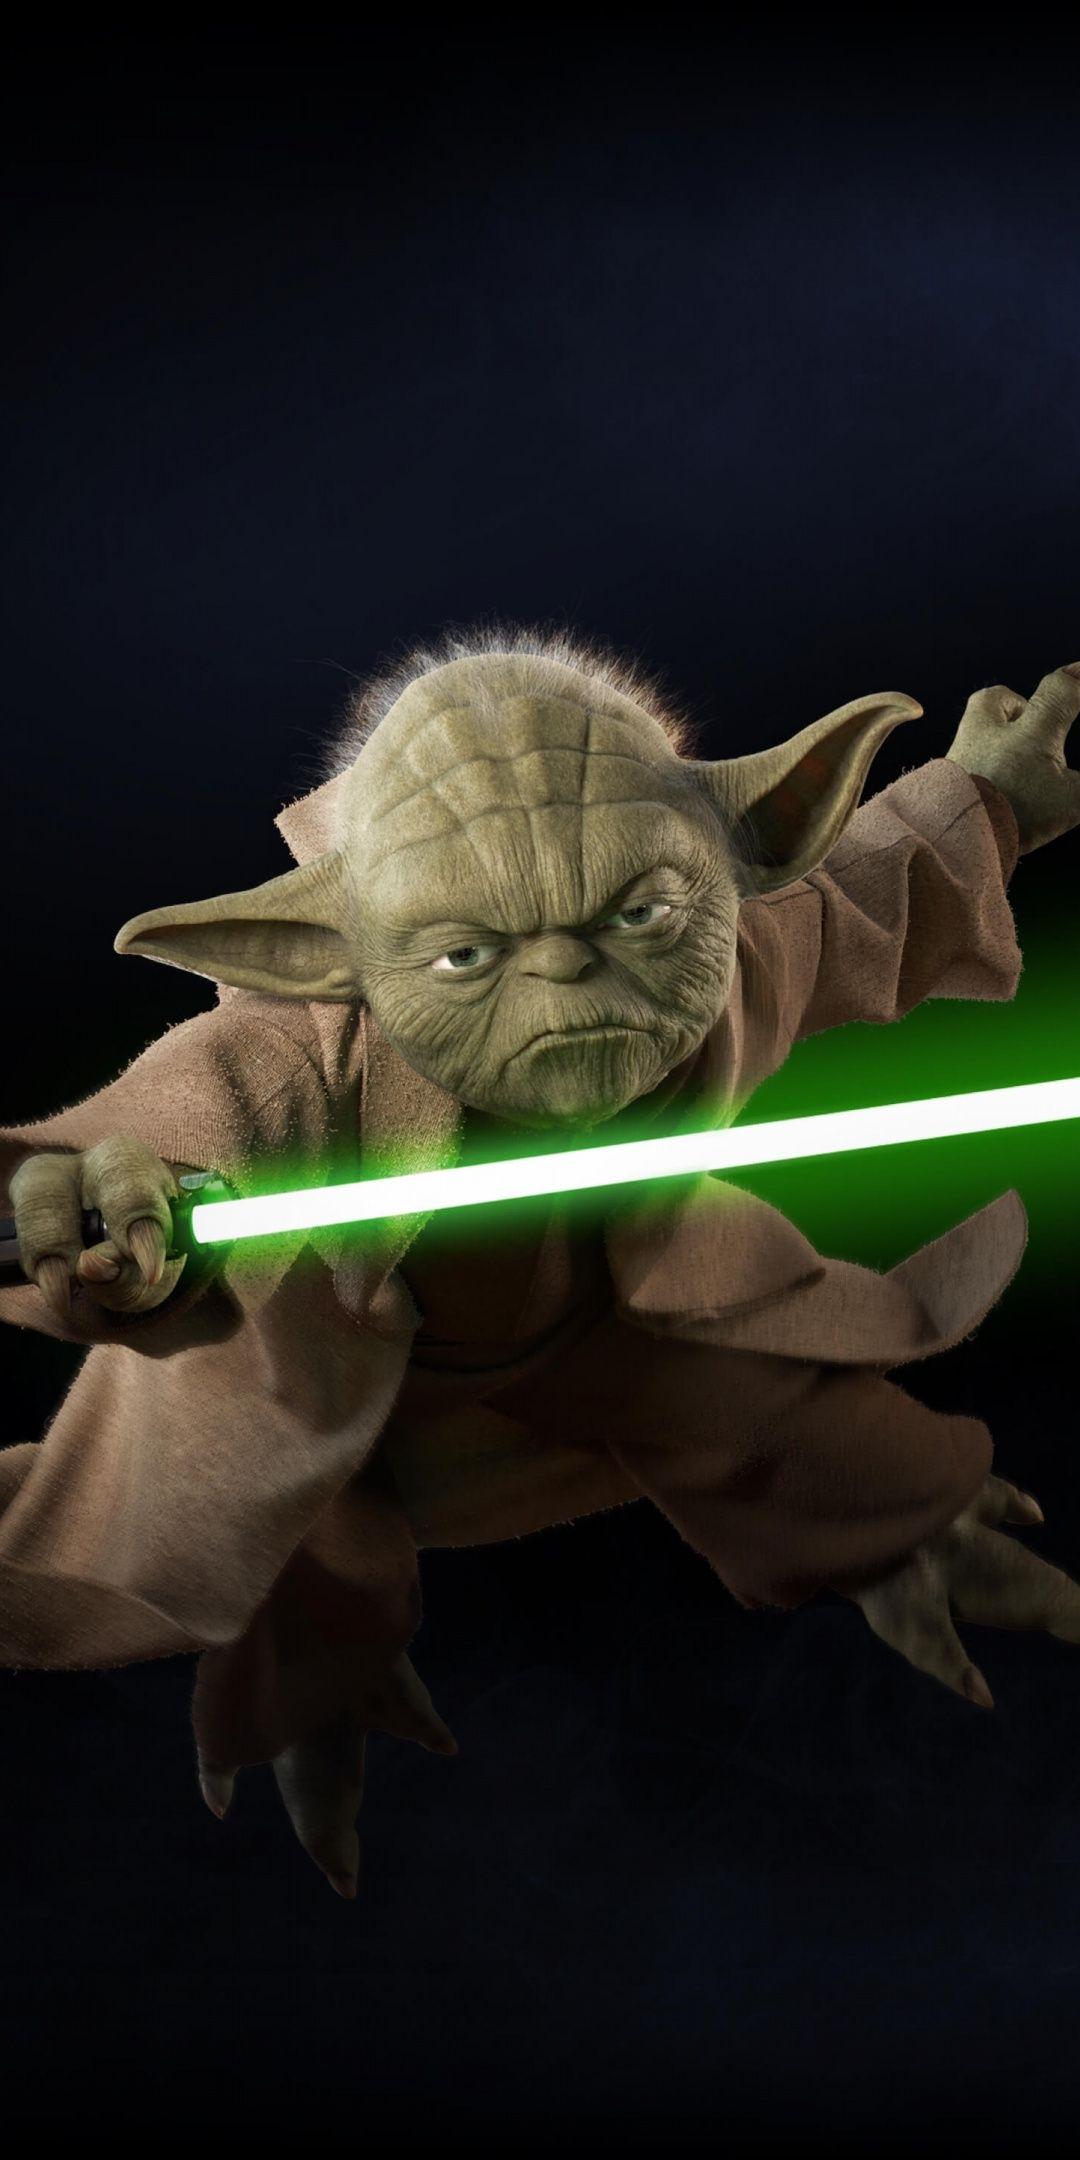 Yoda, Star Wars Battlefront II, video game, minimal